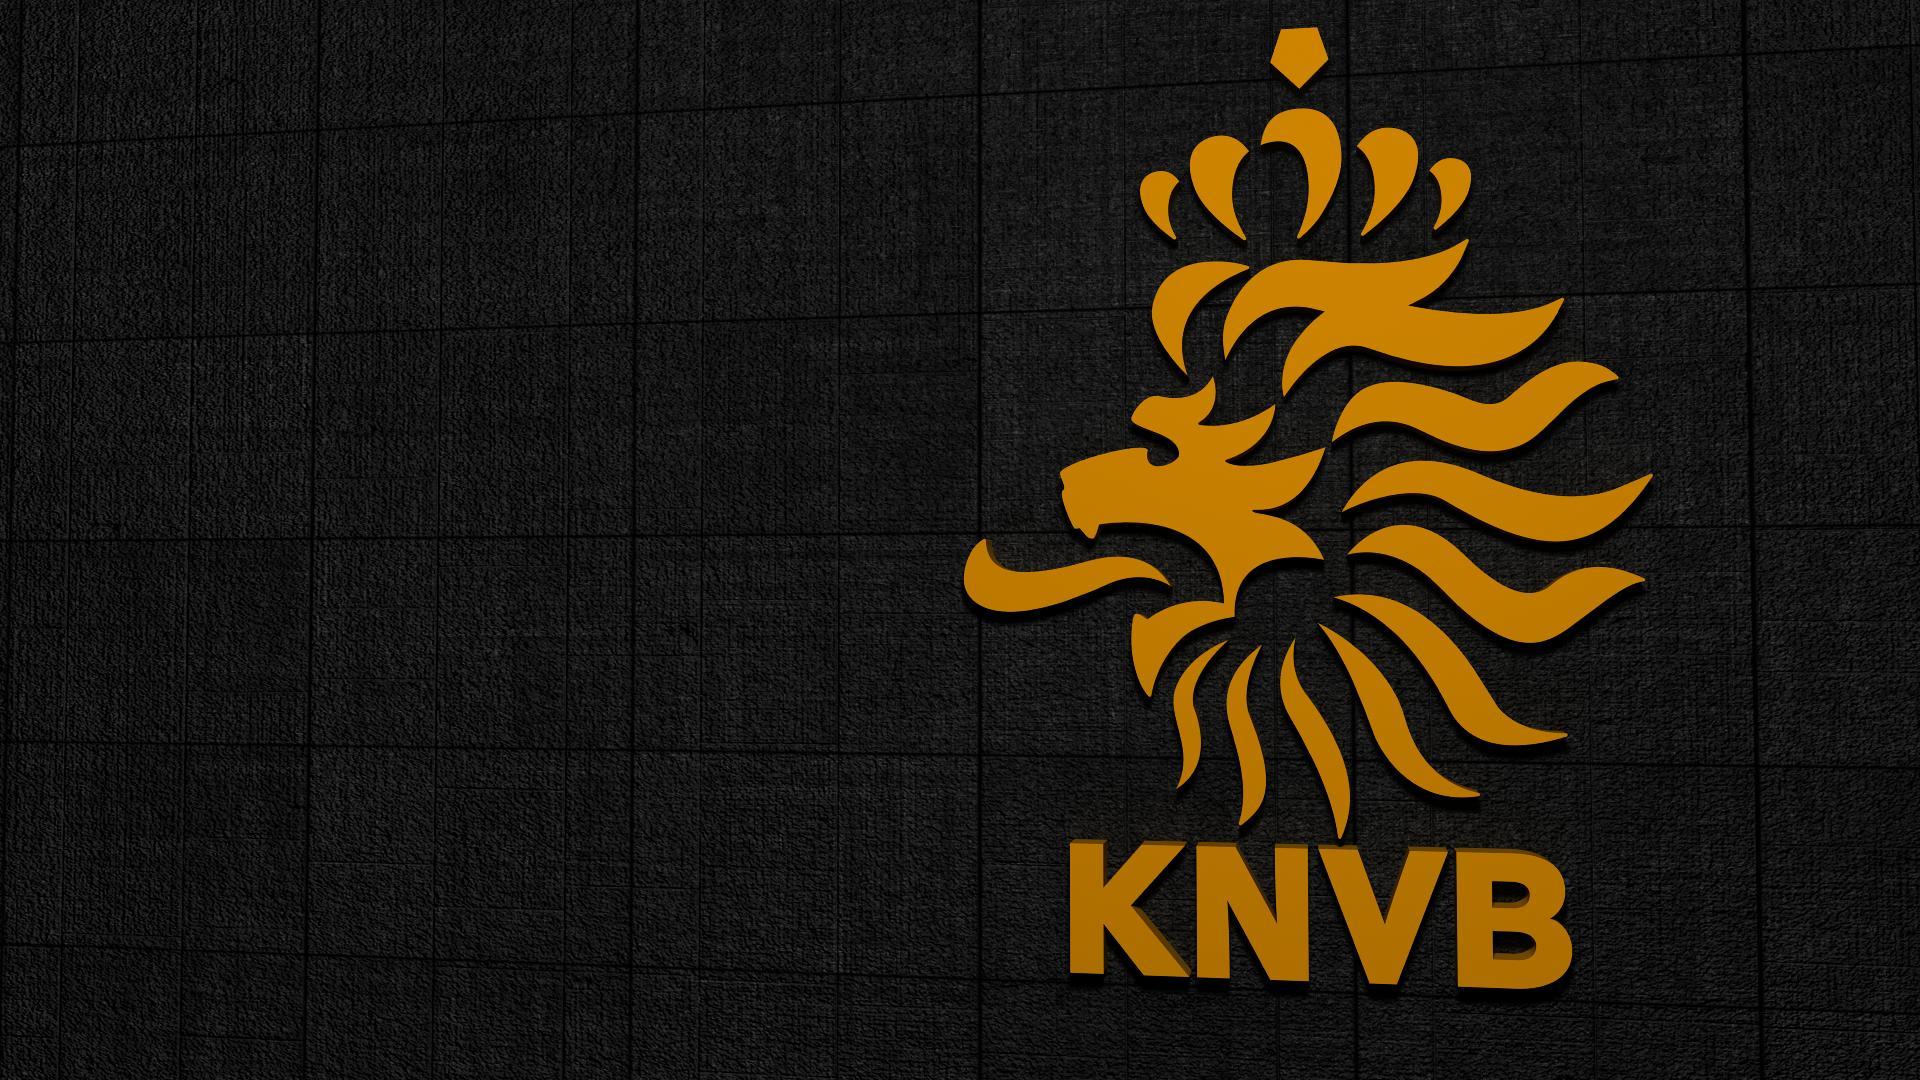 Knvb wallpaper flickr photo sharing - Photo wallpaper ...